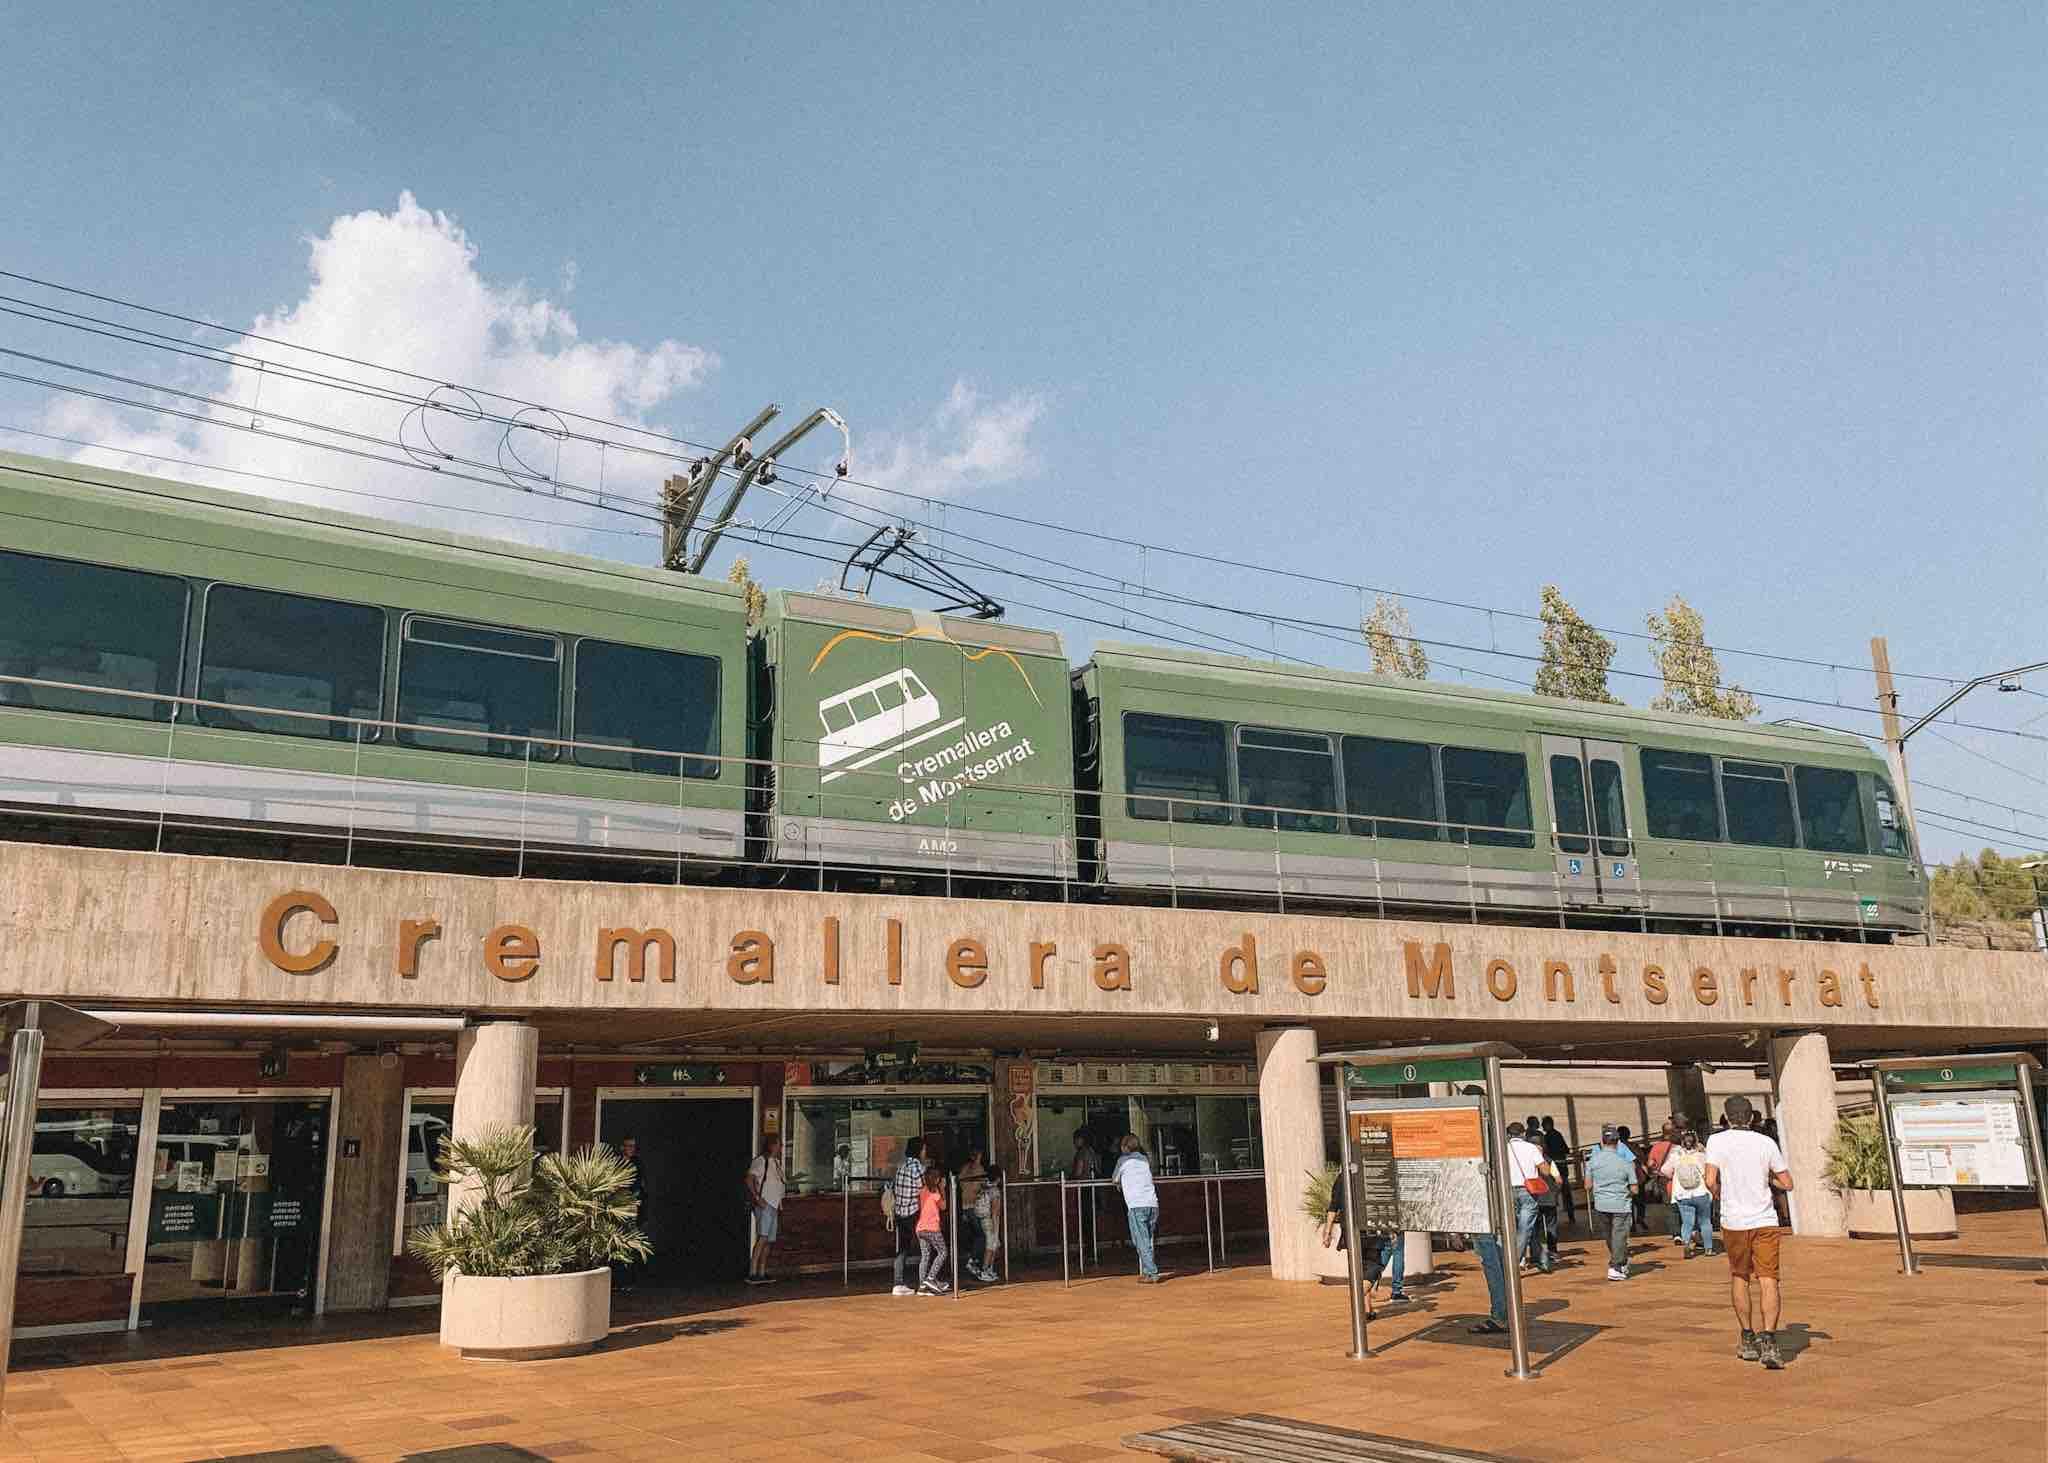 Barcelona-a-Montserrat-trem-cremallera